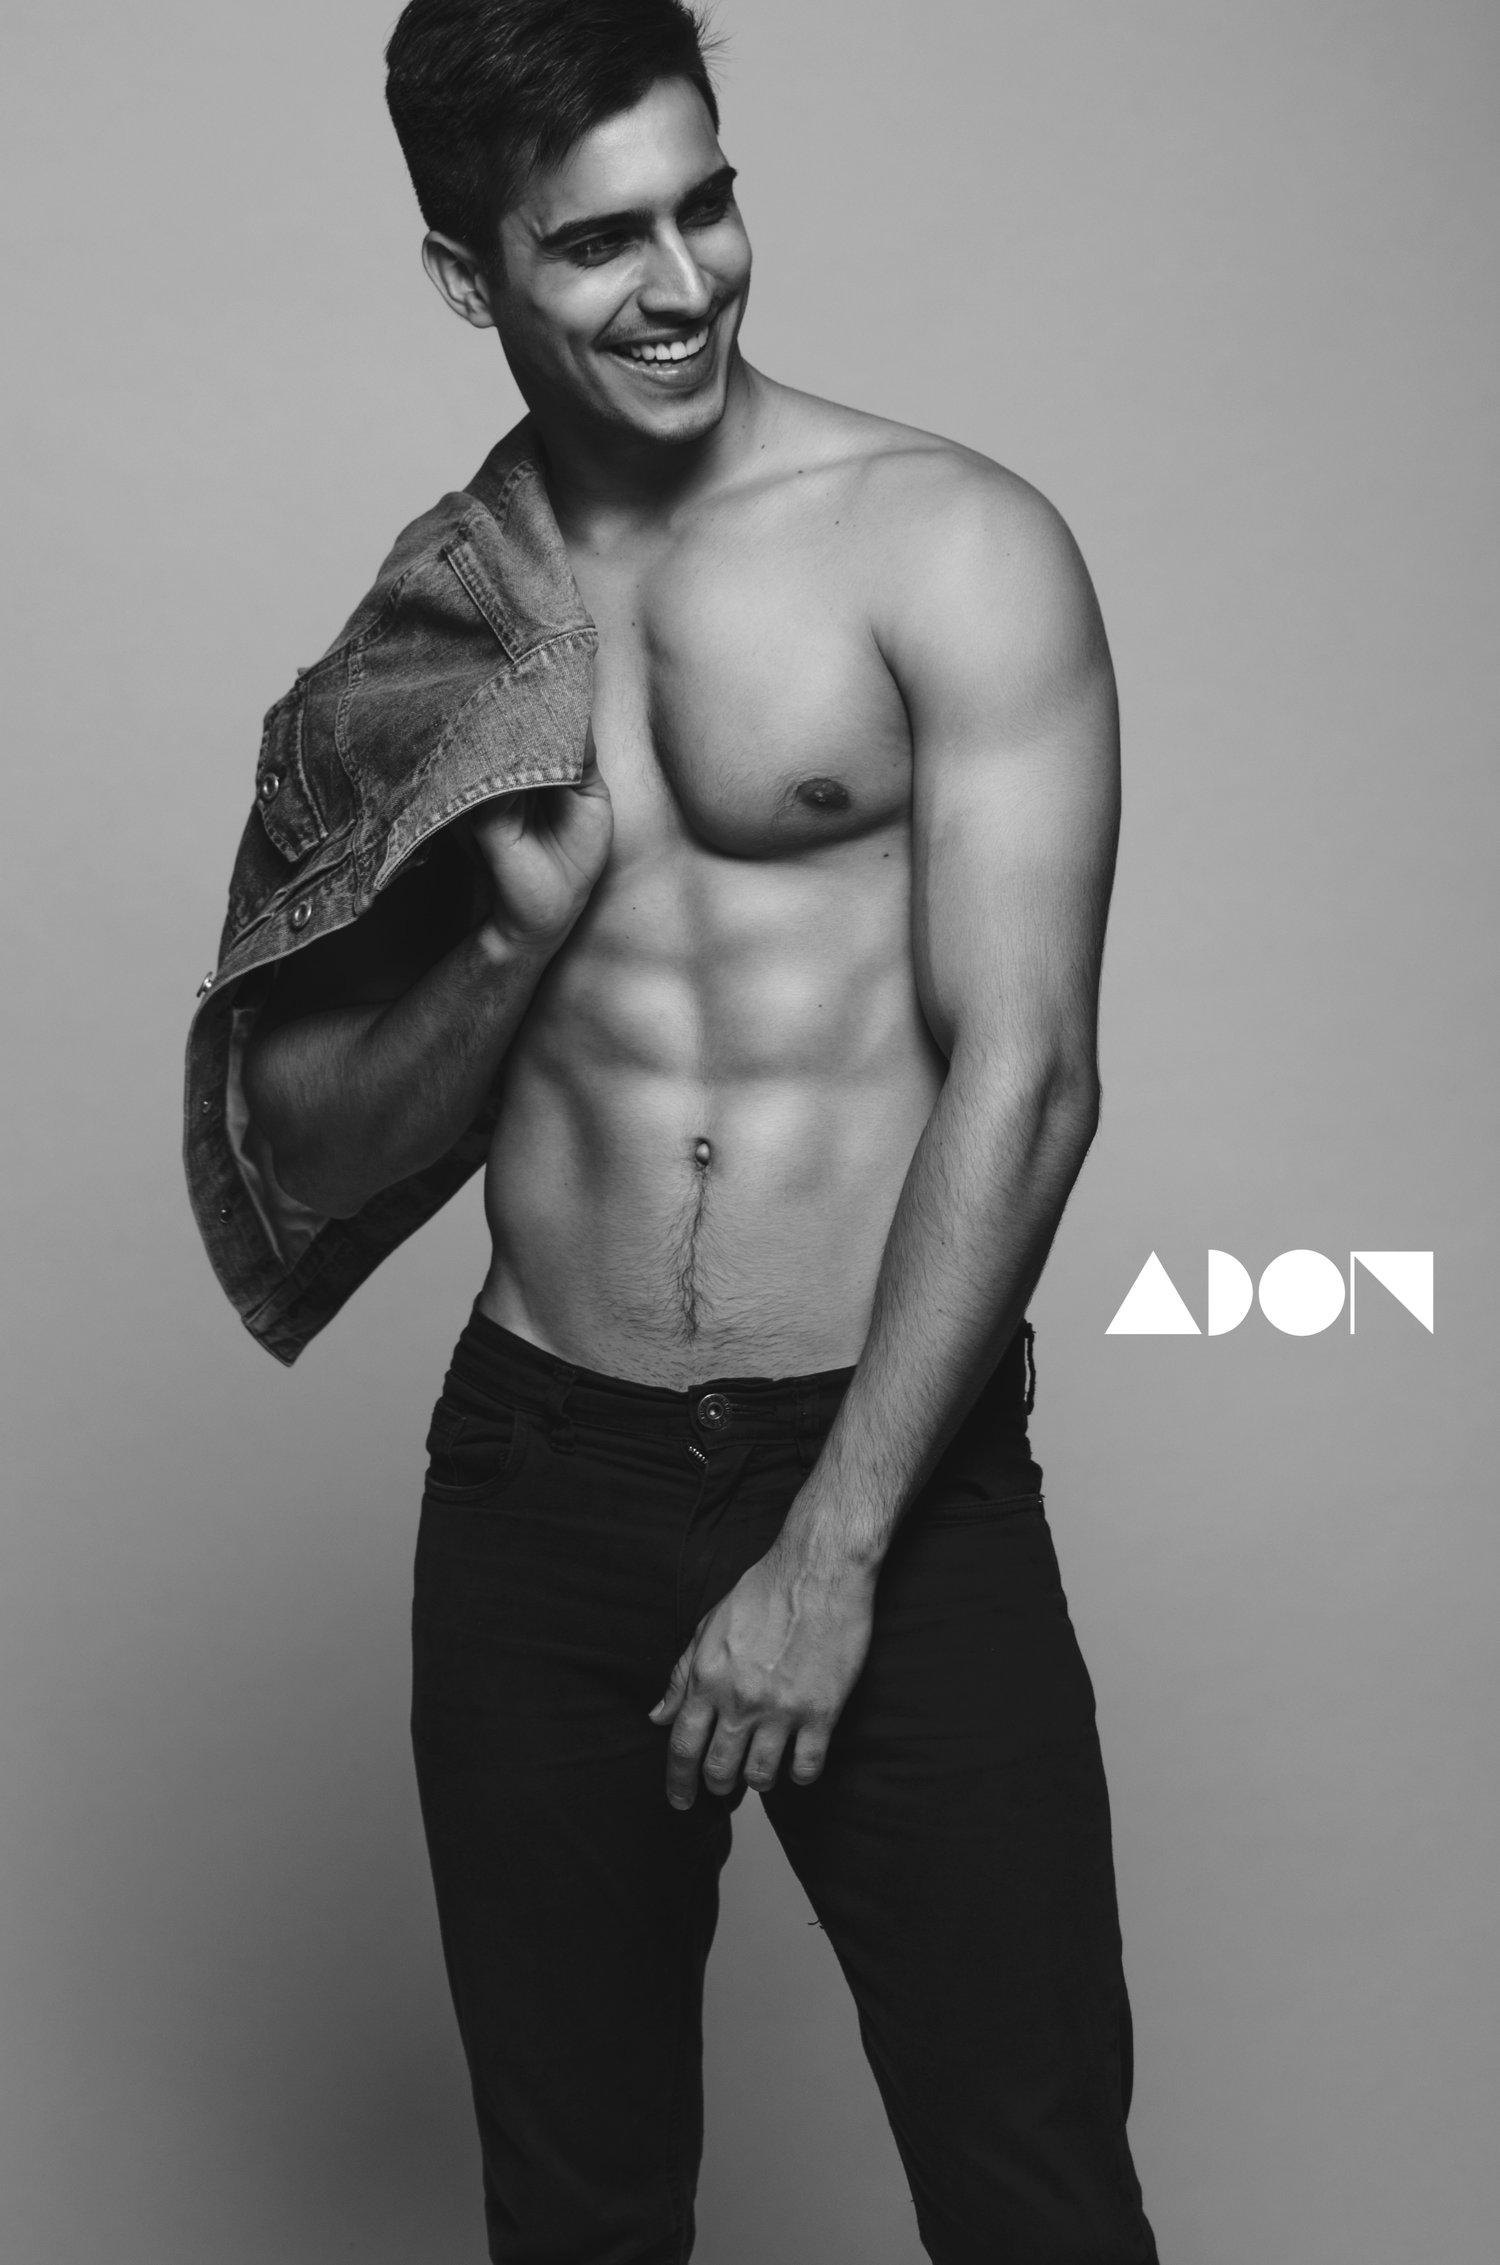 Adon Exclusive: Model Gabriel Braghin By Sixto Hombrebueno II